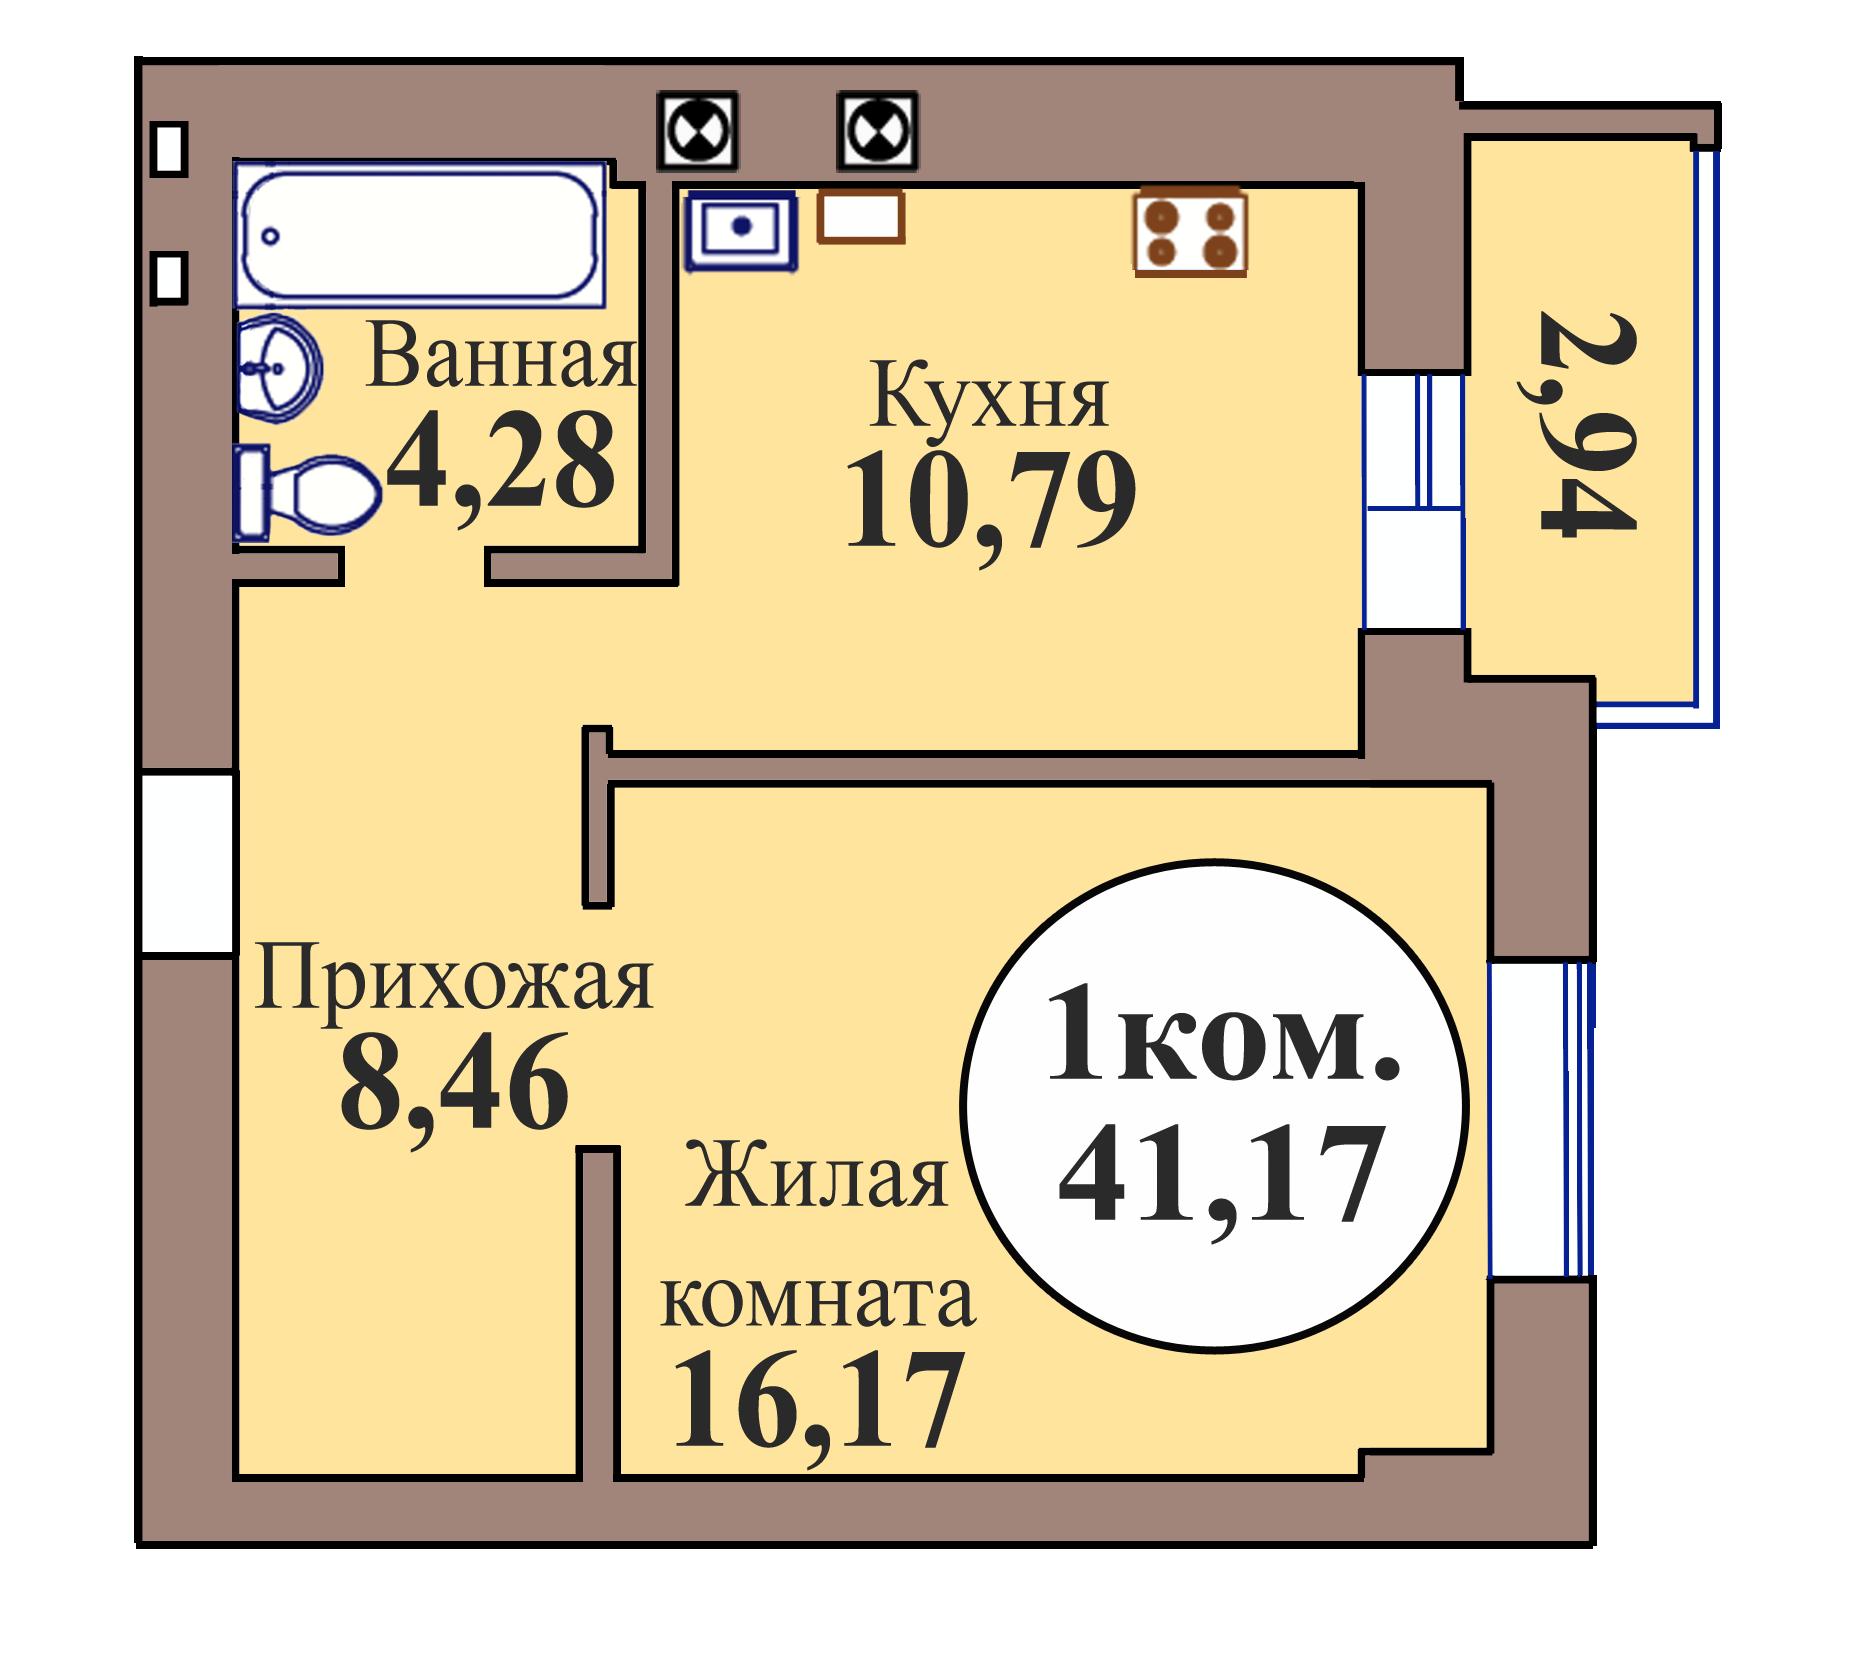 1-комн. кв. по пер. Калининградский, 5 кв. 118 в Калининграде